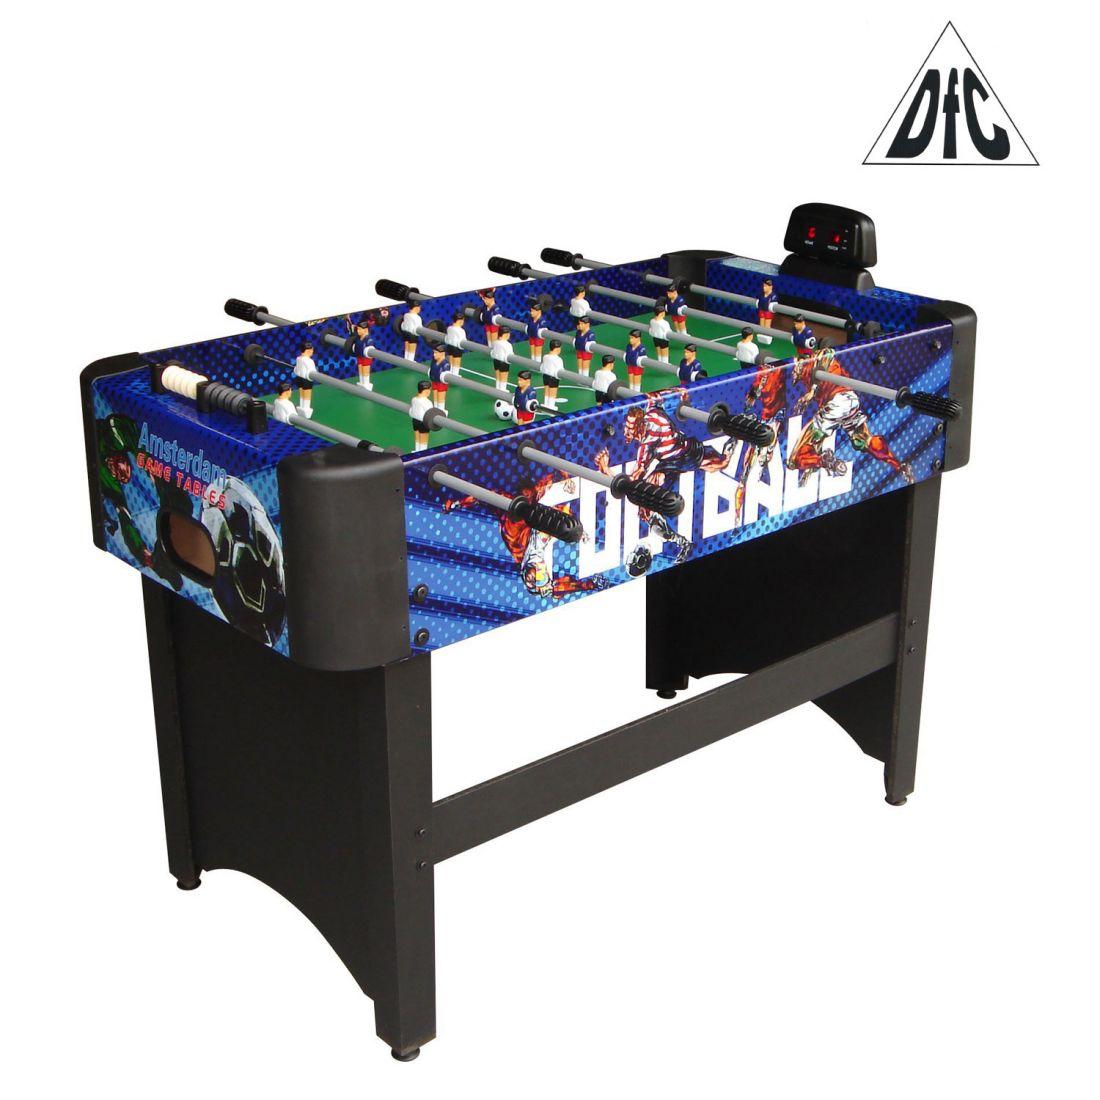 Игровой стол DFC Amsterdam Pro футбол GS-ST-1025